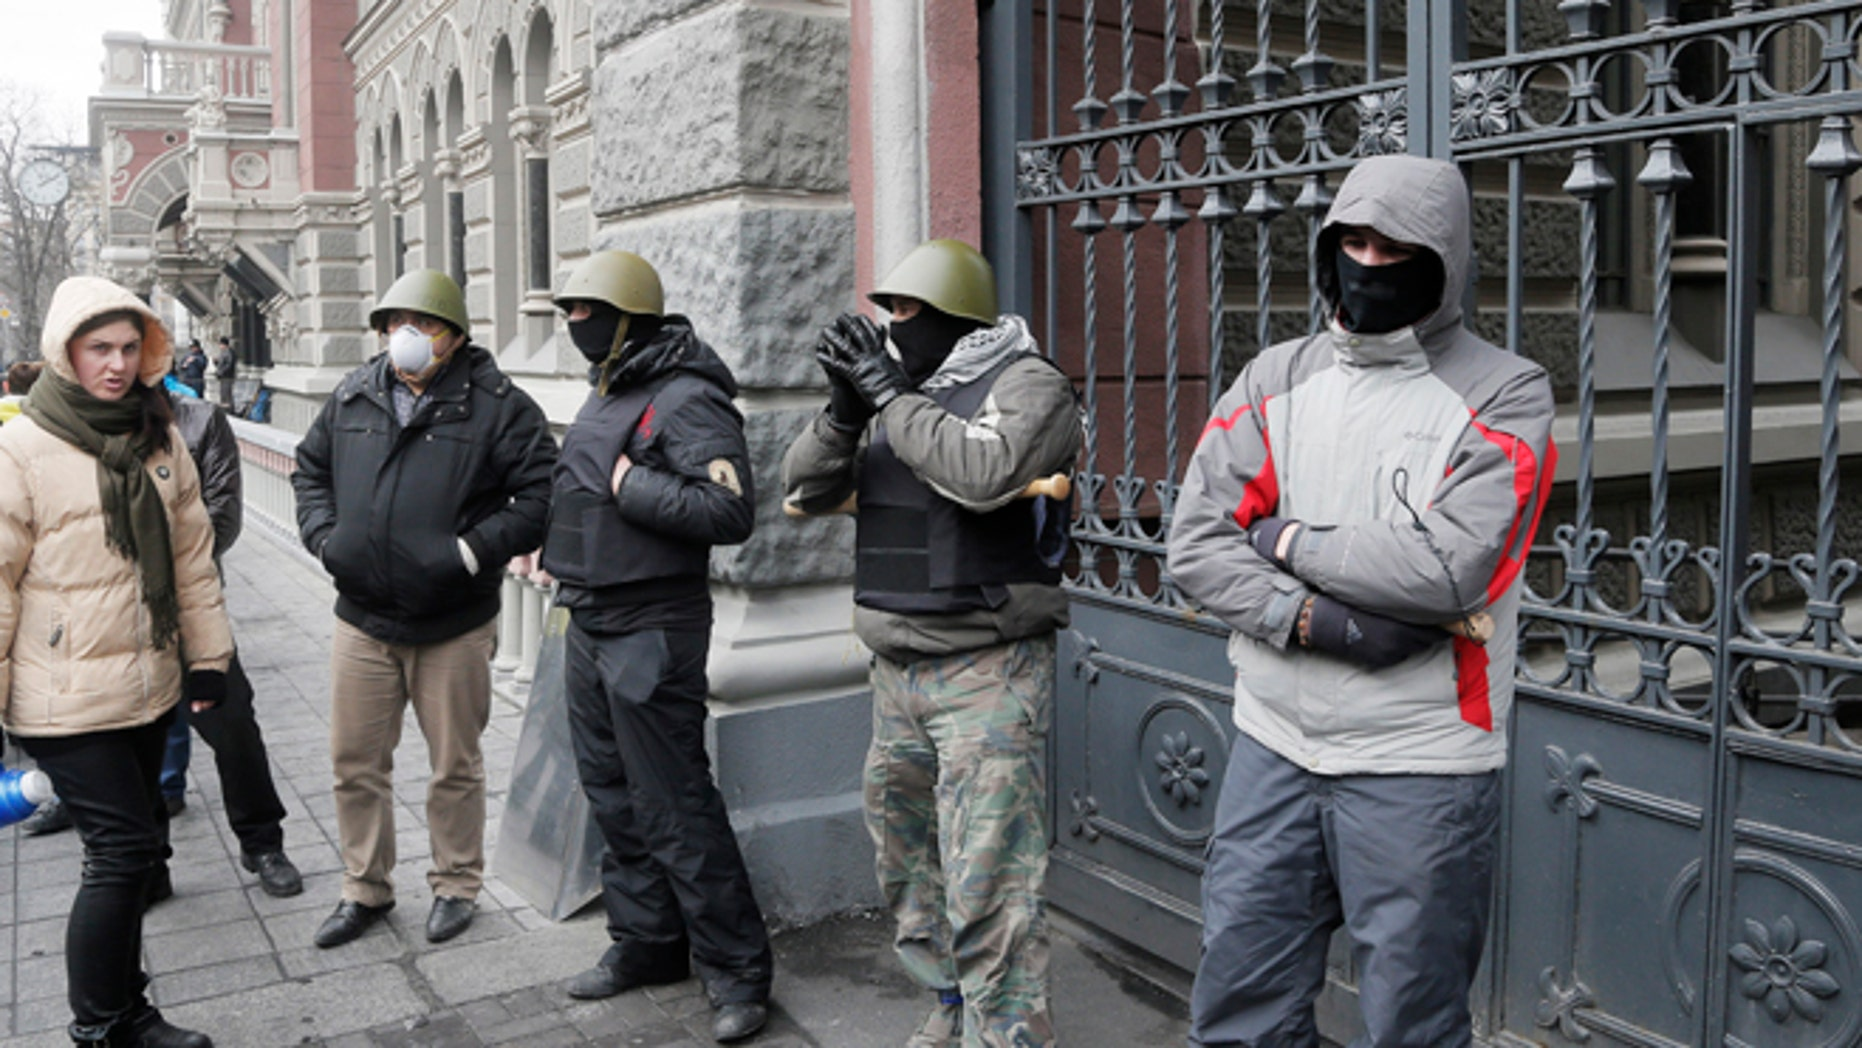 Feb. 23, 2014: Activists in Independence Square, the epicenter of Ukraine's recent unrest, Ukraine.